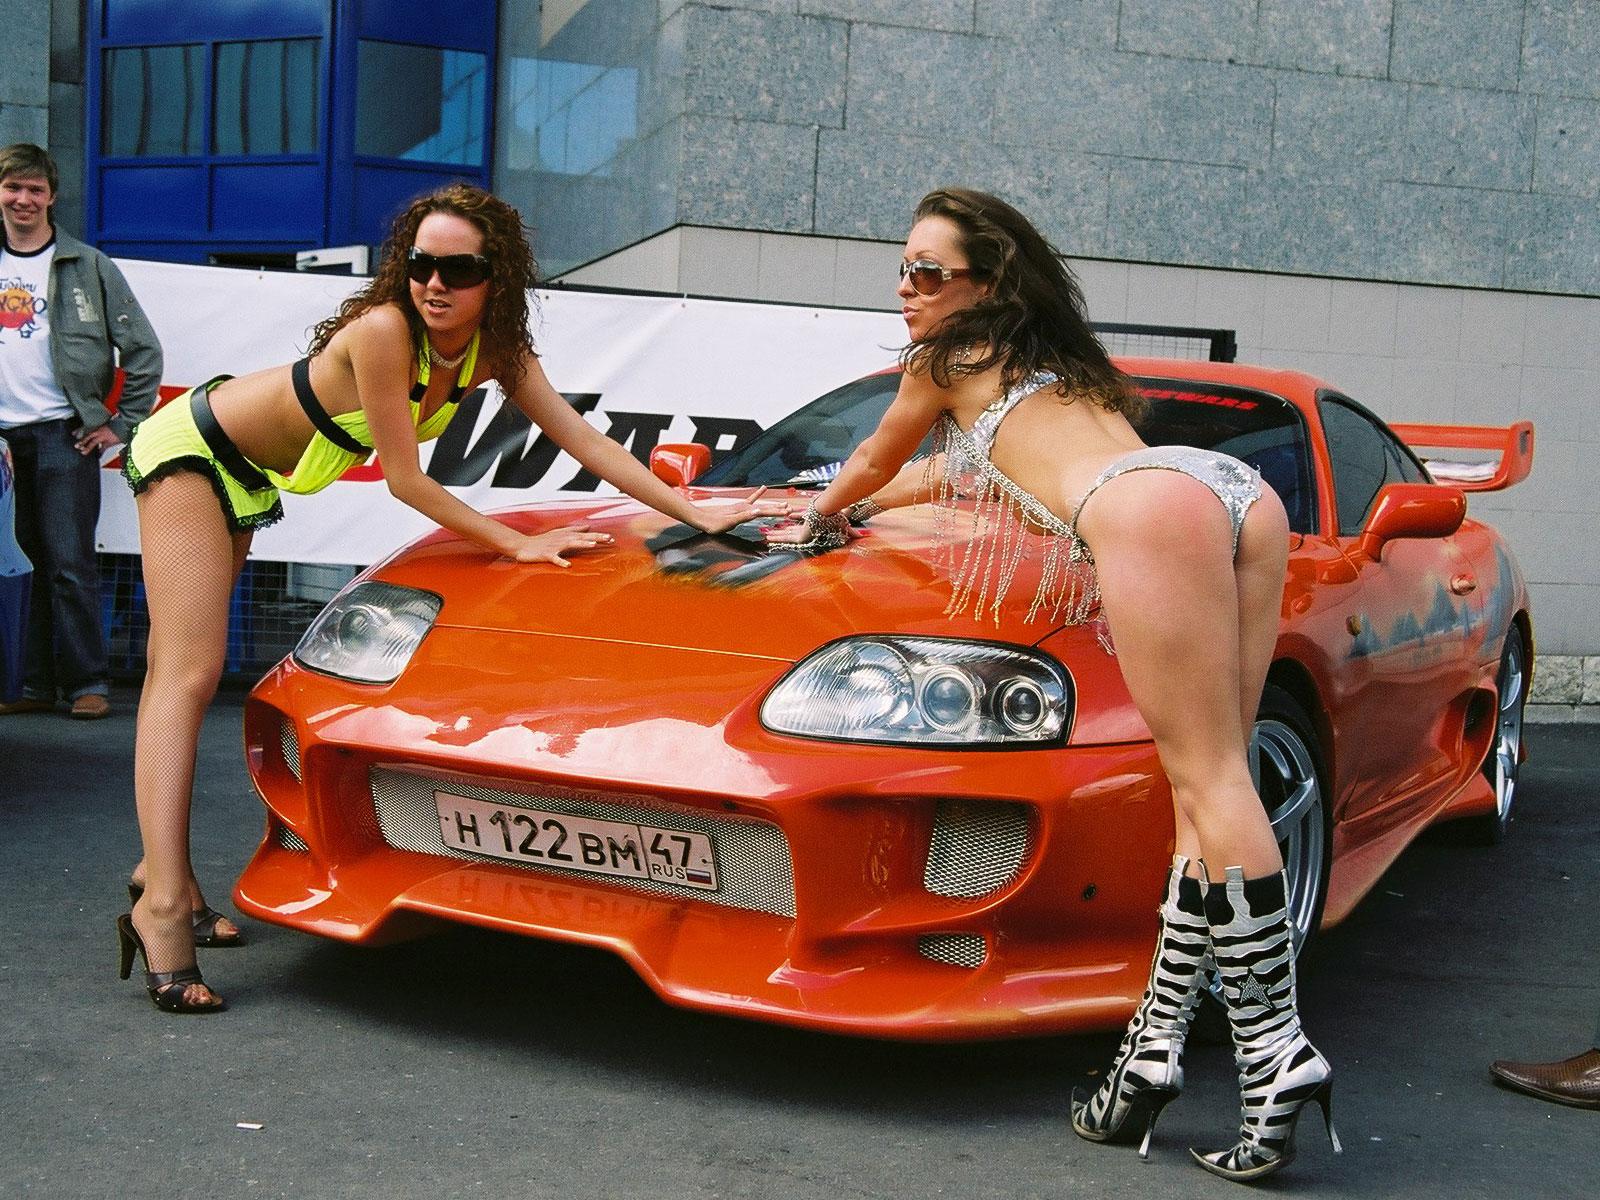 Cool Cars Girls